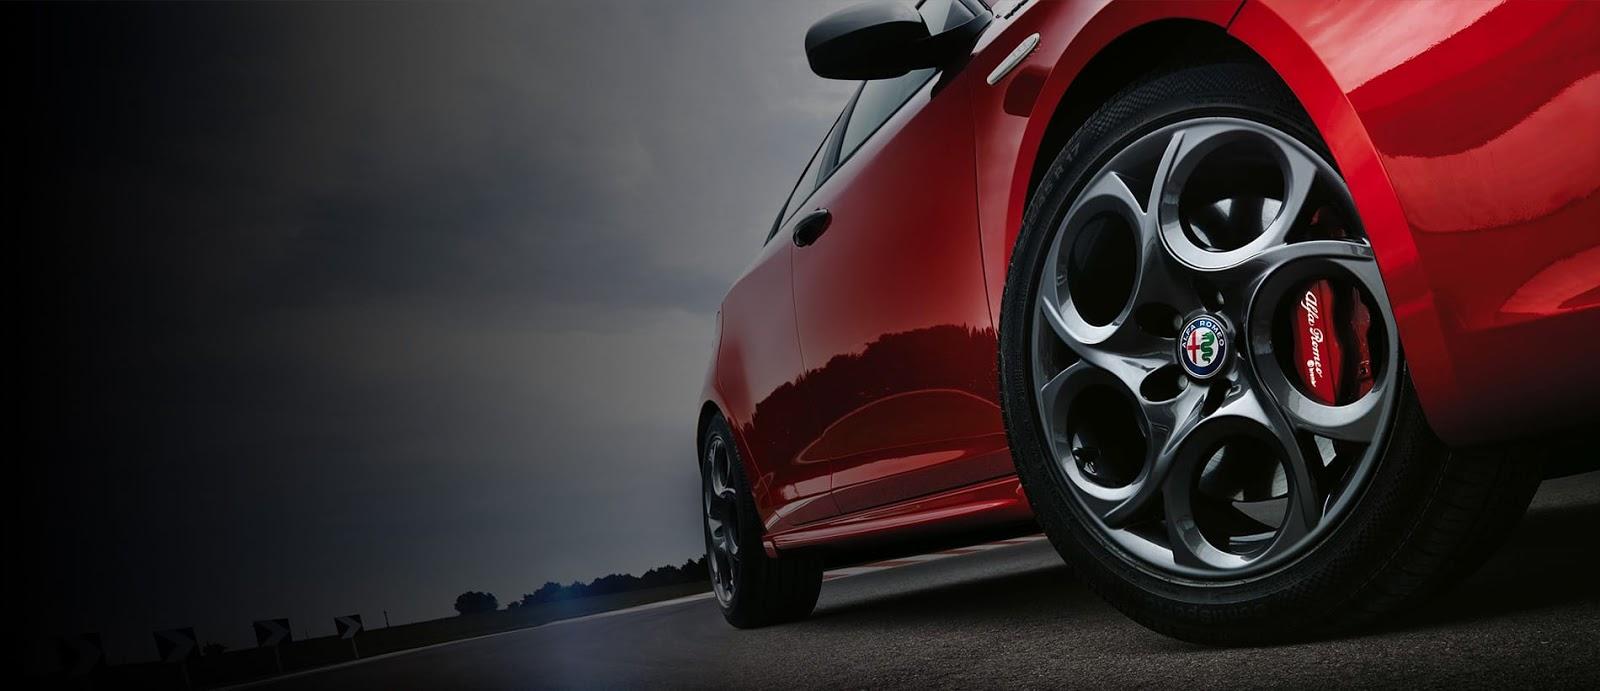 giulietta super suspensions Νέα έκδοση Alfa Romeo Giulietta SUPER, με SUPER τιμή!